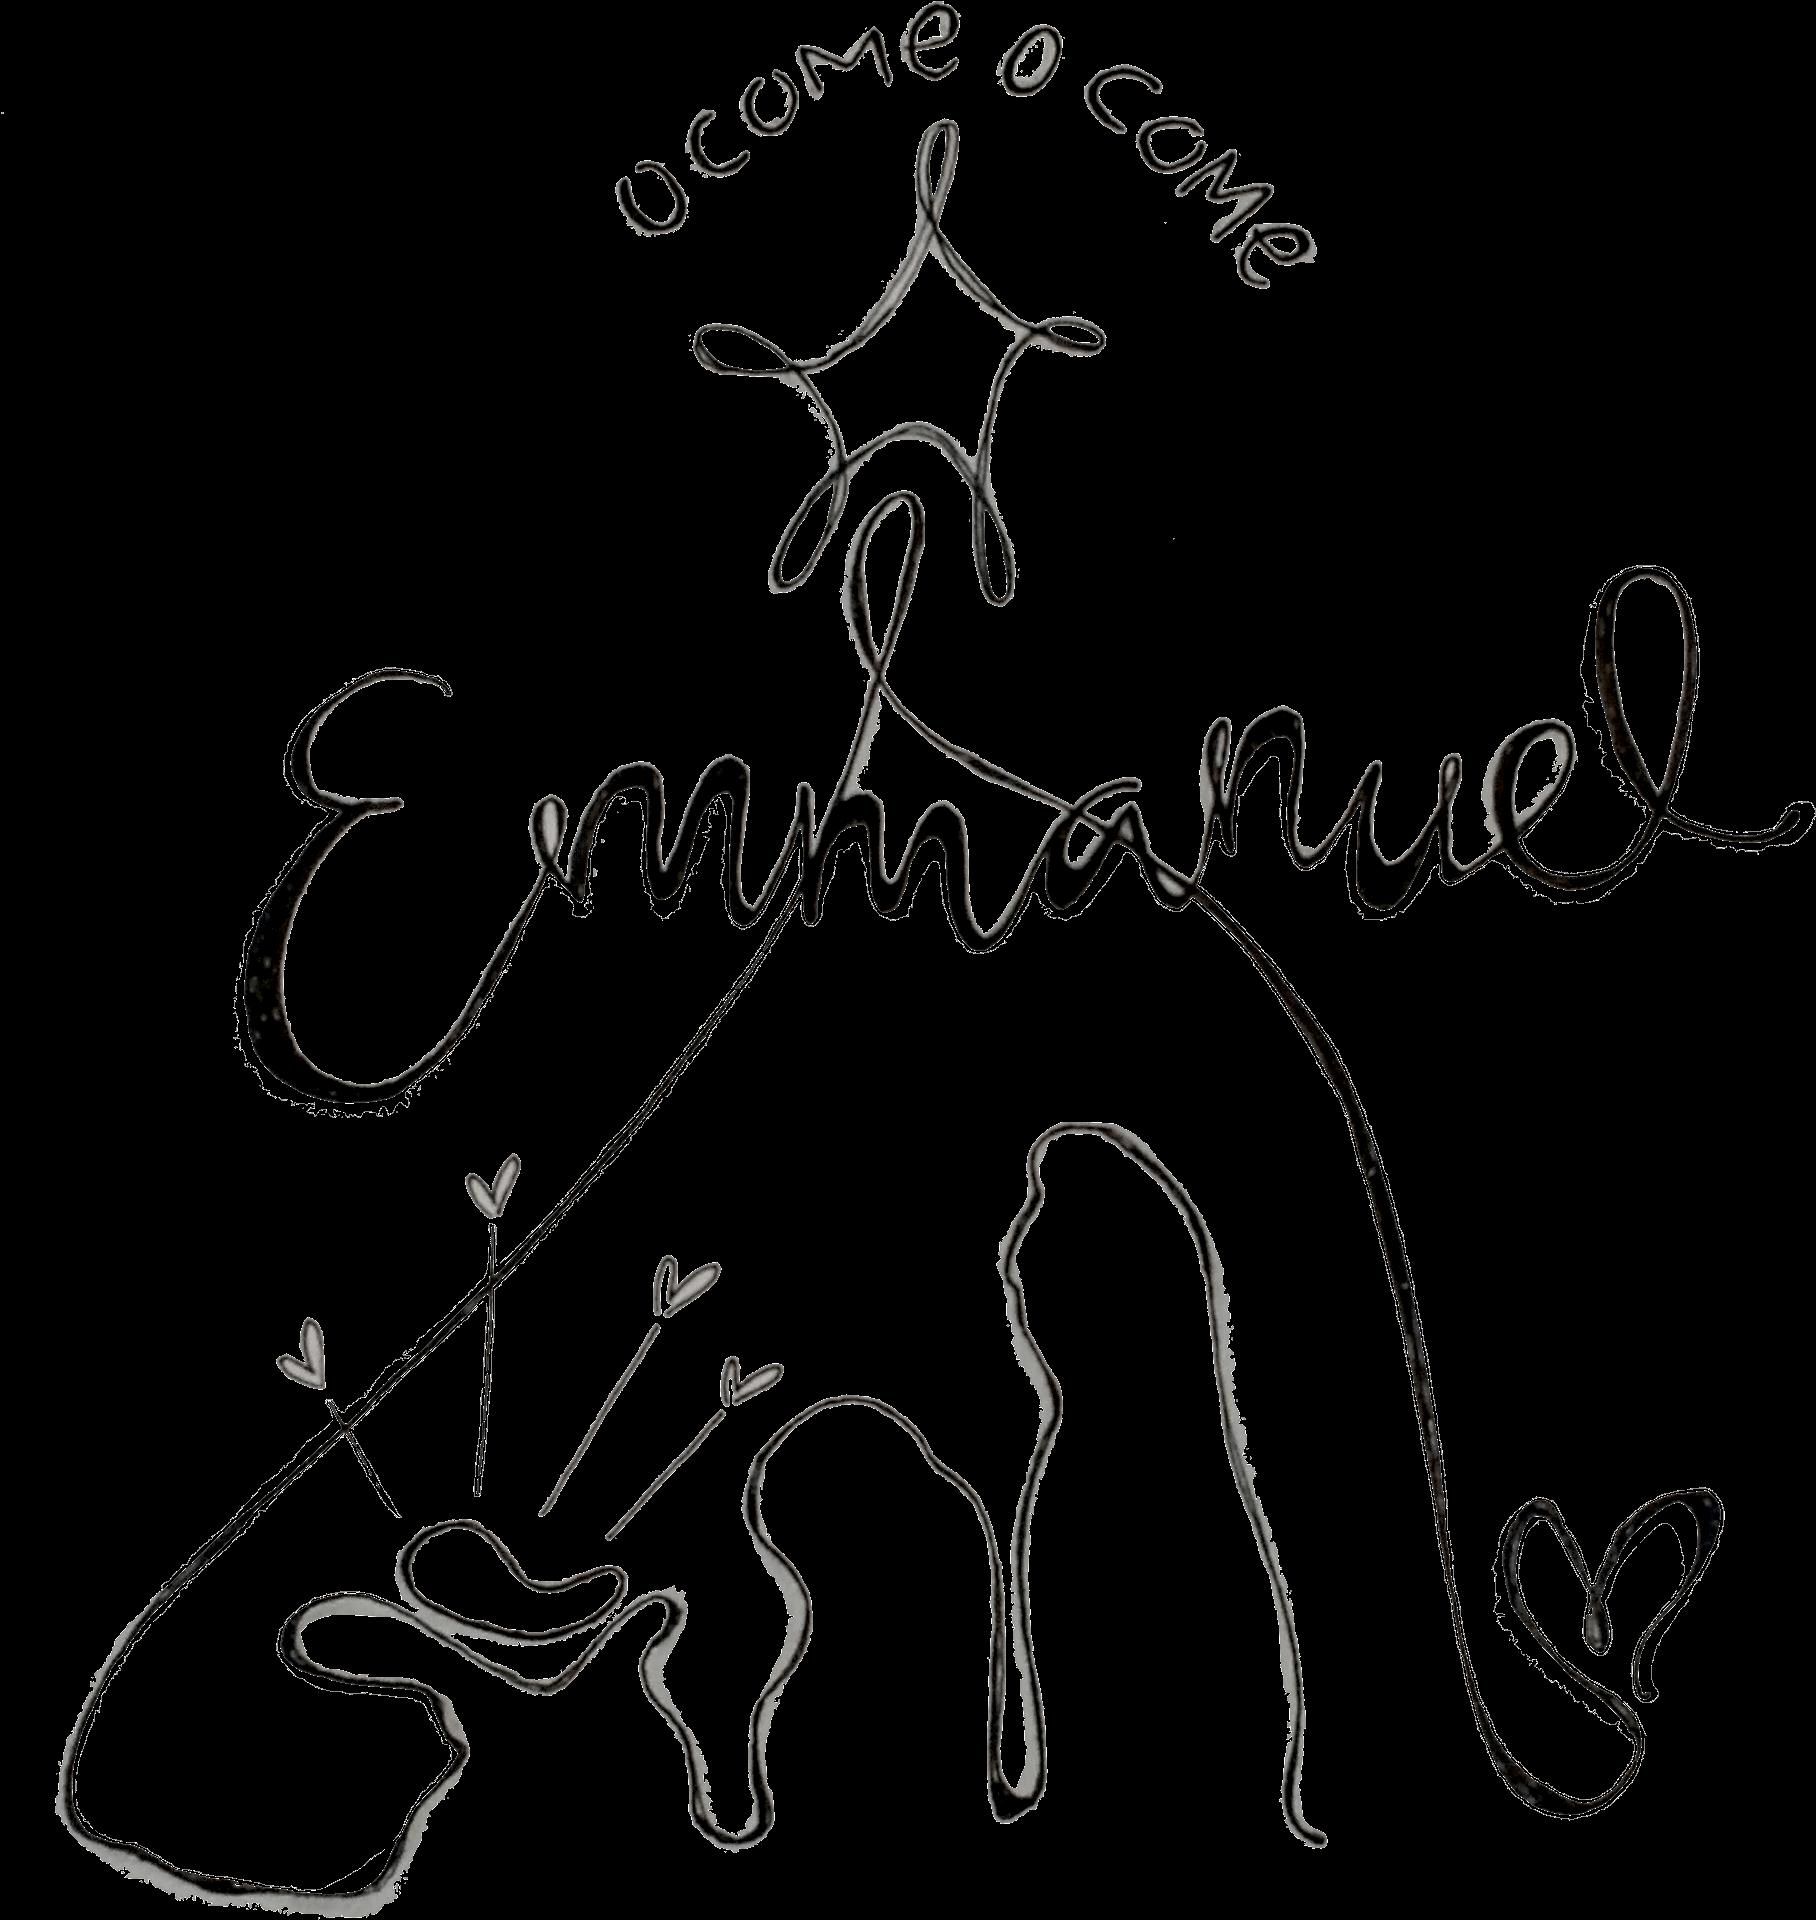 Oh come emmanuel clipart picture free download HD Chalkboard Doodles Doodle Ocomeemmanuel Suecarroll - O Come O ... picture free download